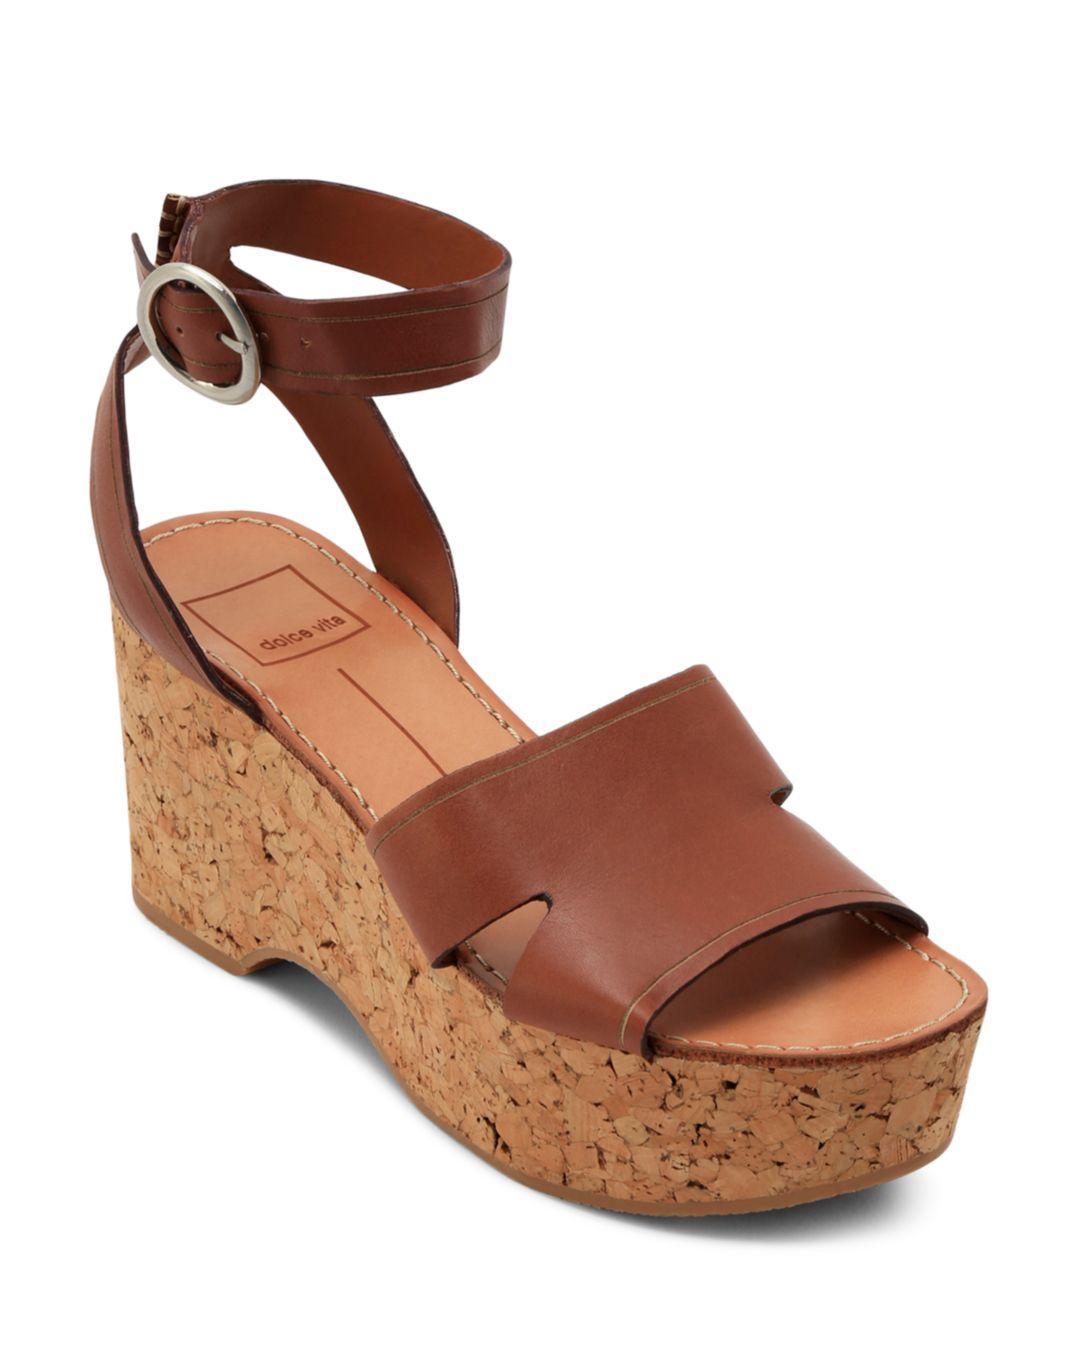 ac0dd50f0f42 Lyst - Dolce Vita Women s Linda Leather   Cork Platform Sandals in Brown